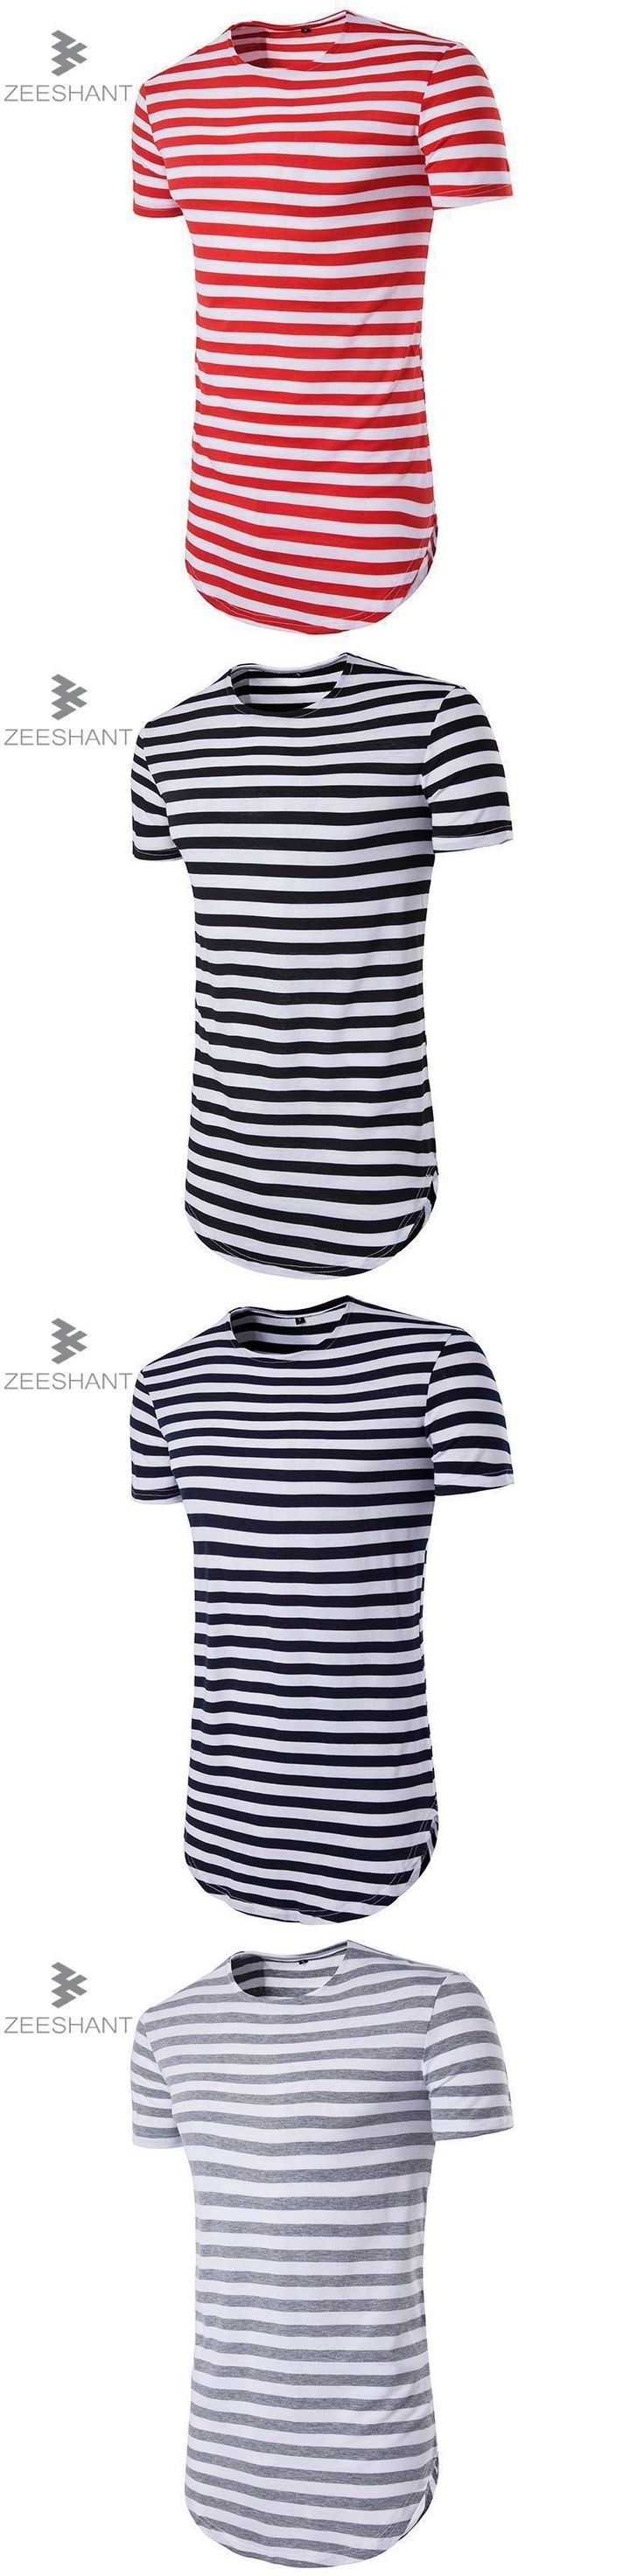 ZEESHANT Streetwear Men t shirt extended longline hipster t shirt men stripes t shirt Homme Long Line Striped T shirt Homme #menst-shirtshipster